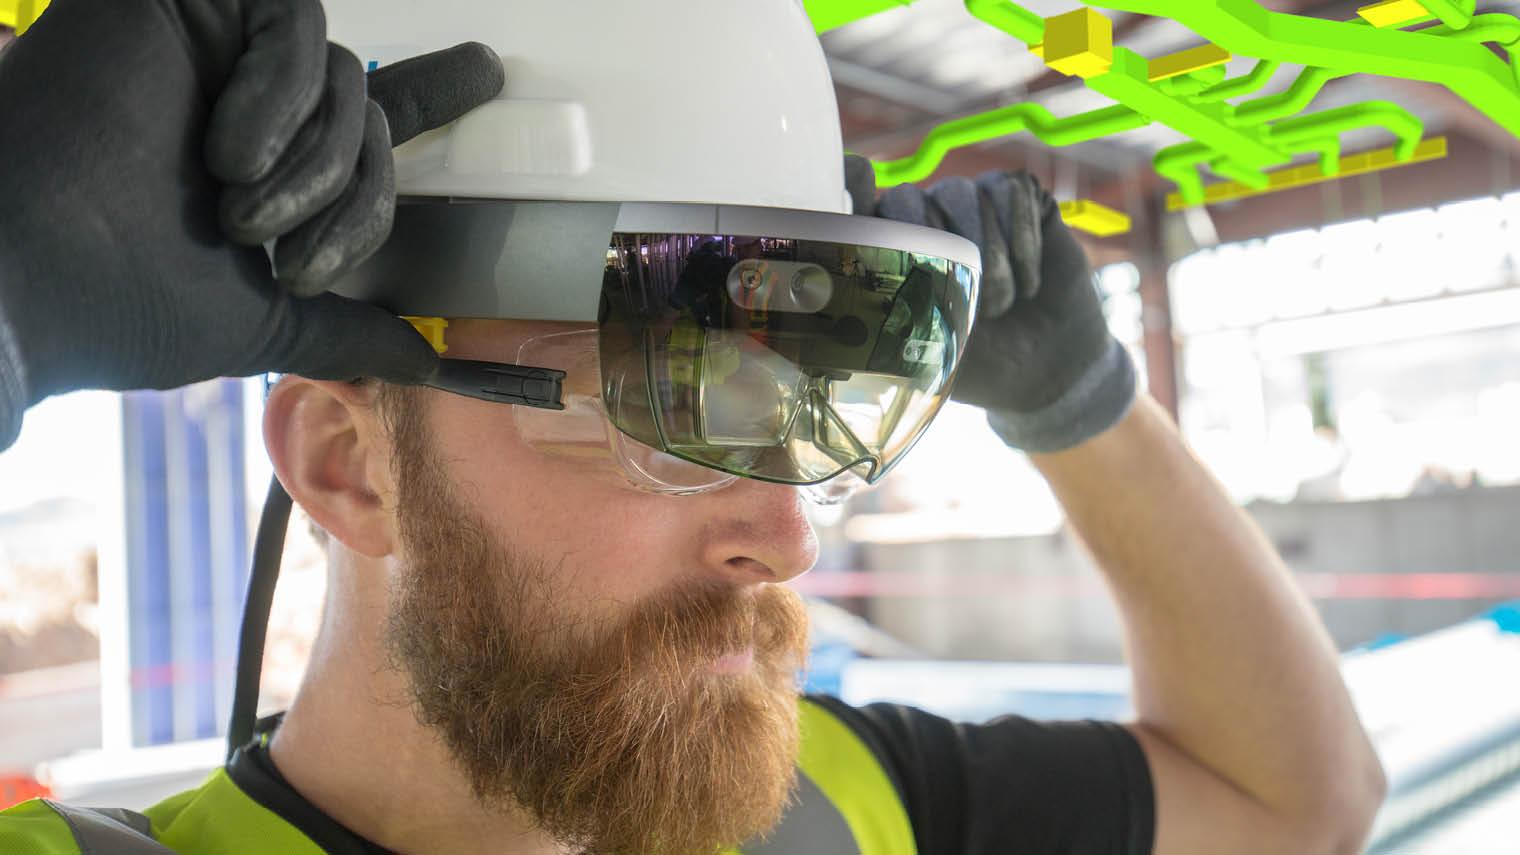 VR: the new training tool for hazardous work - Raconteur